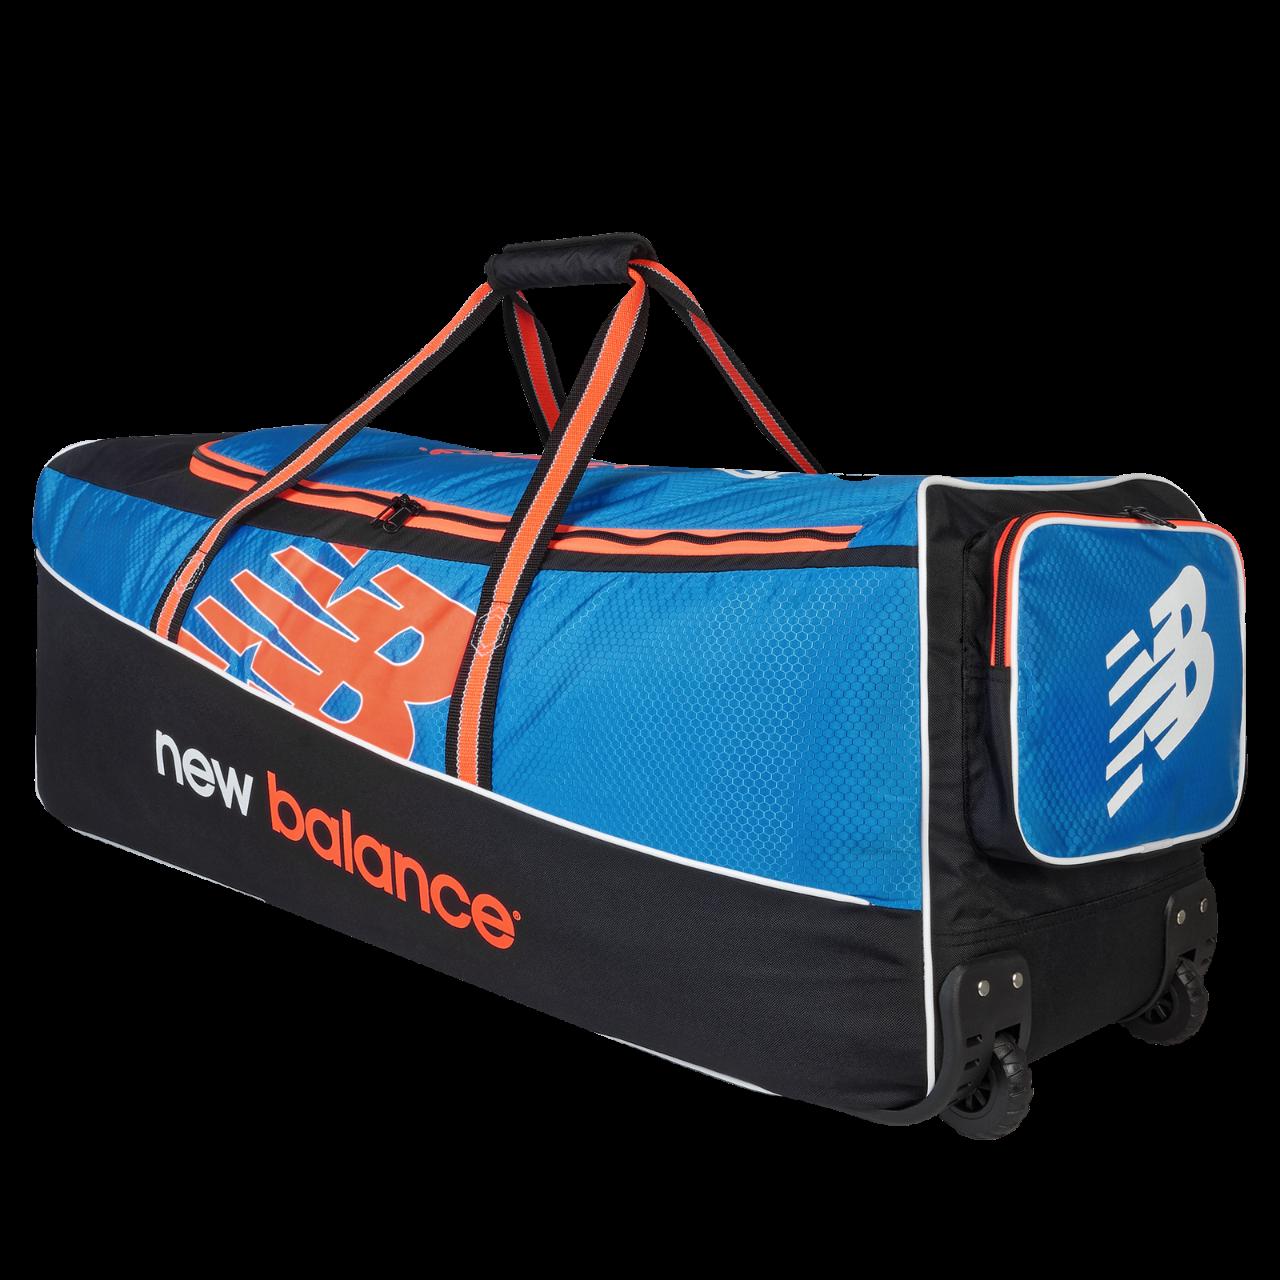 2020 New Balance DC 680 Wheelie Cricket Bag